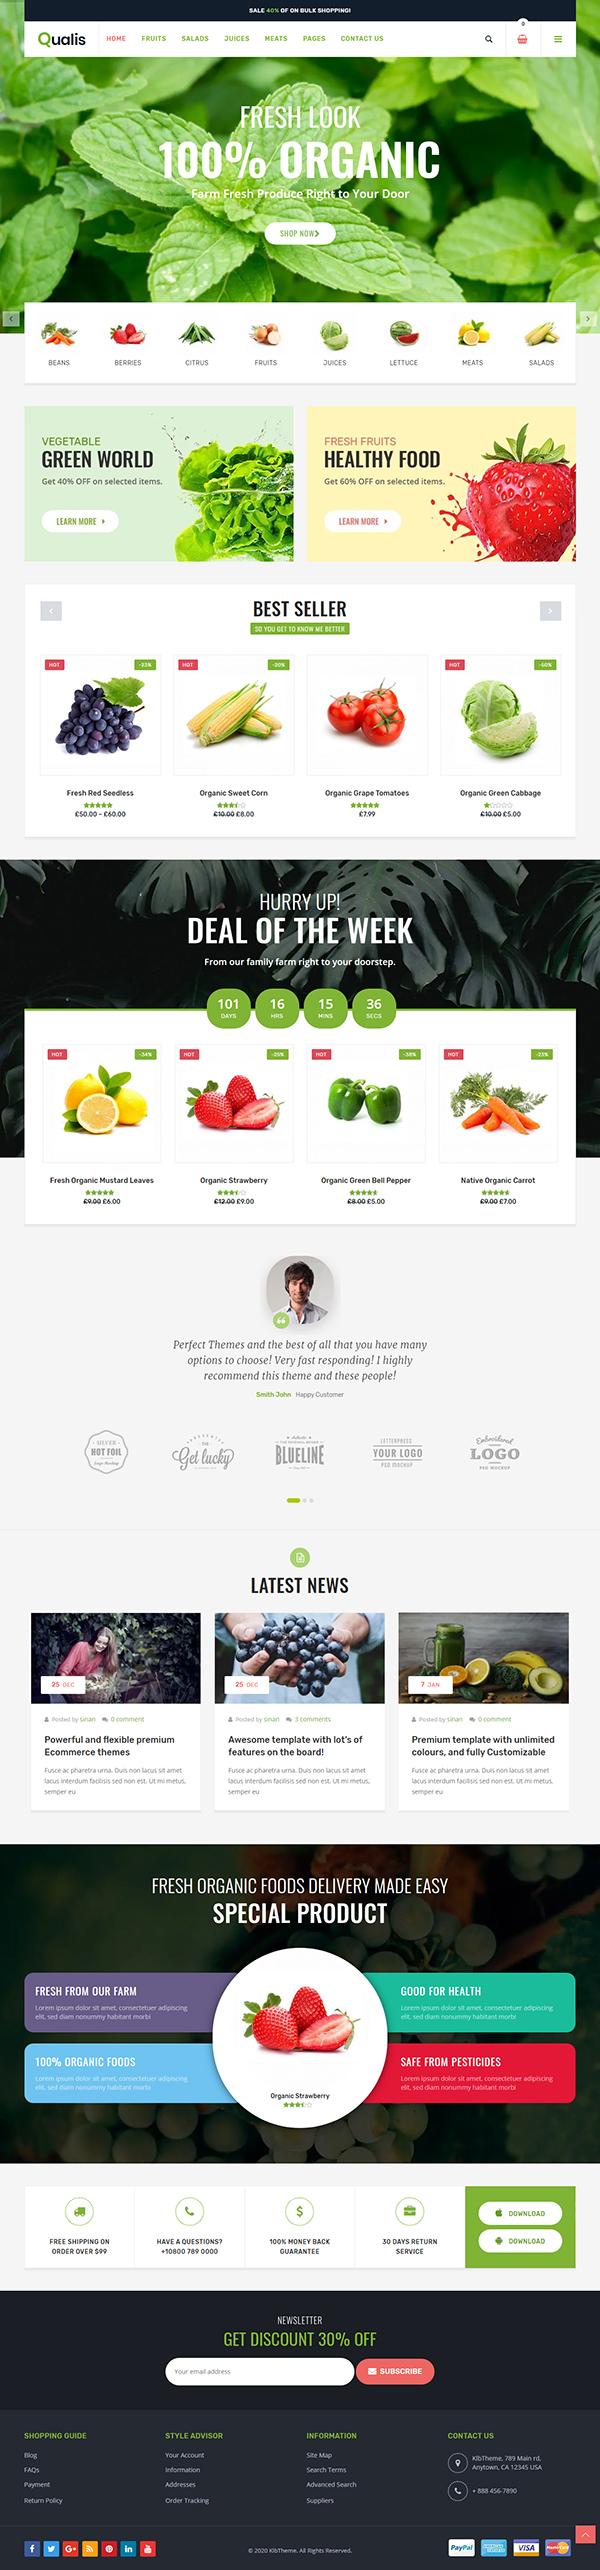 Qualis - Organic Food Responsive eCommerce WordPress Theme